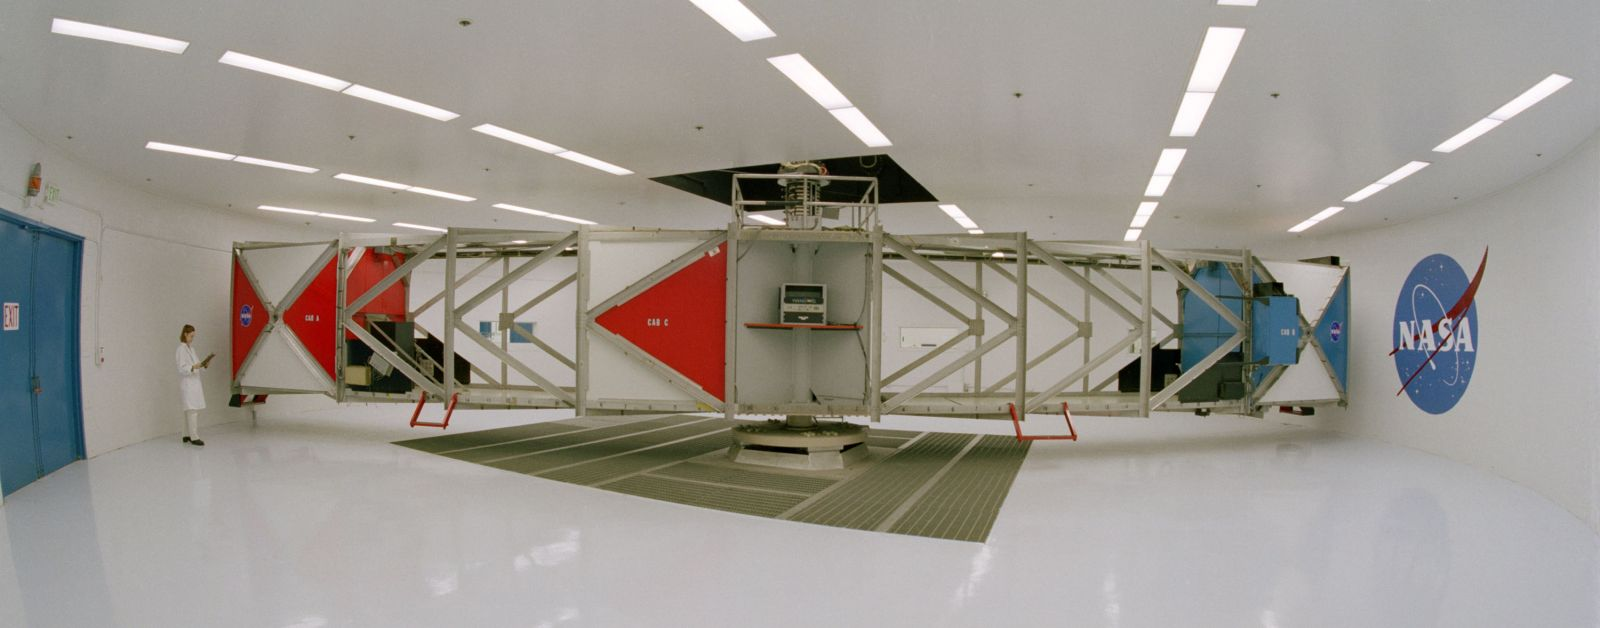 Ames human centrifuge